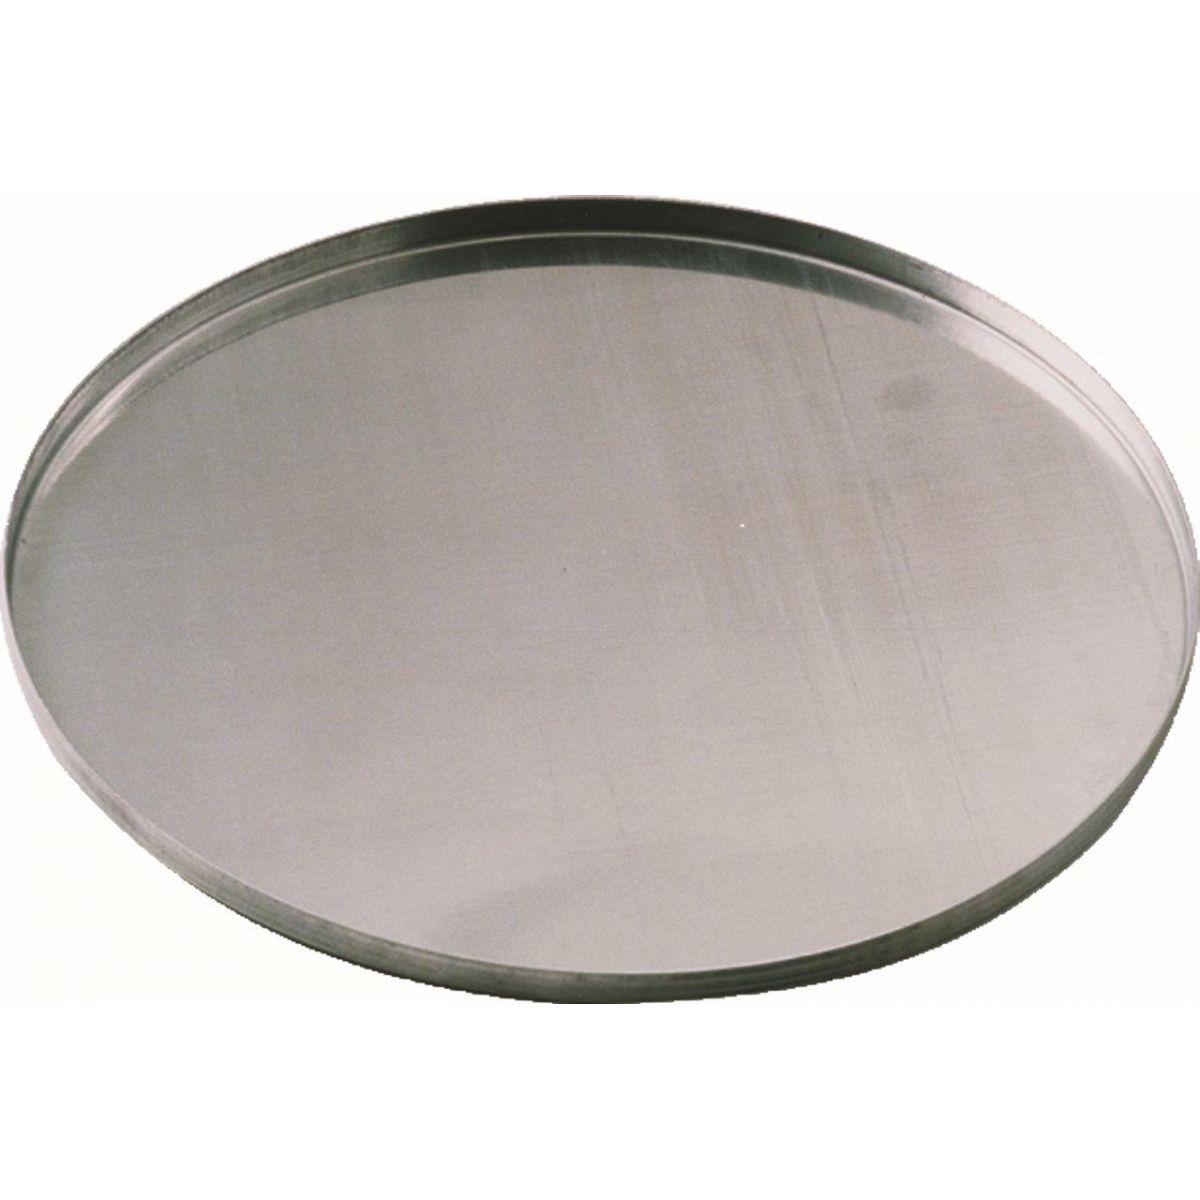 Forma P/ Pizza Nº 3 - 35 cm - Alumínio